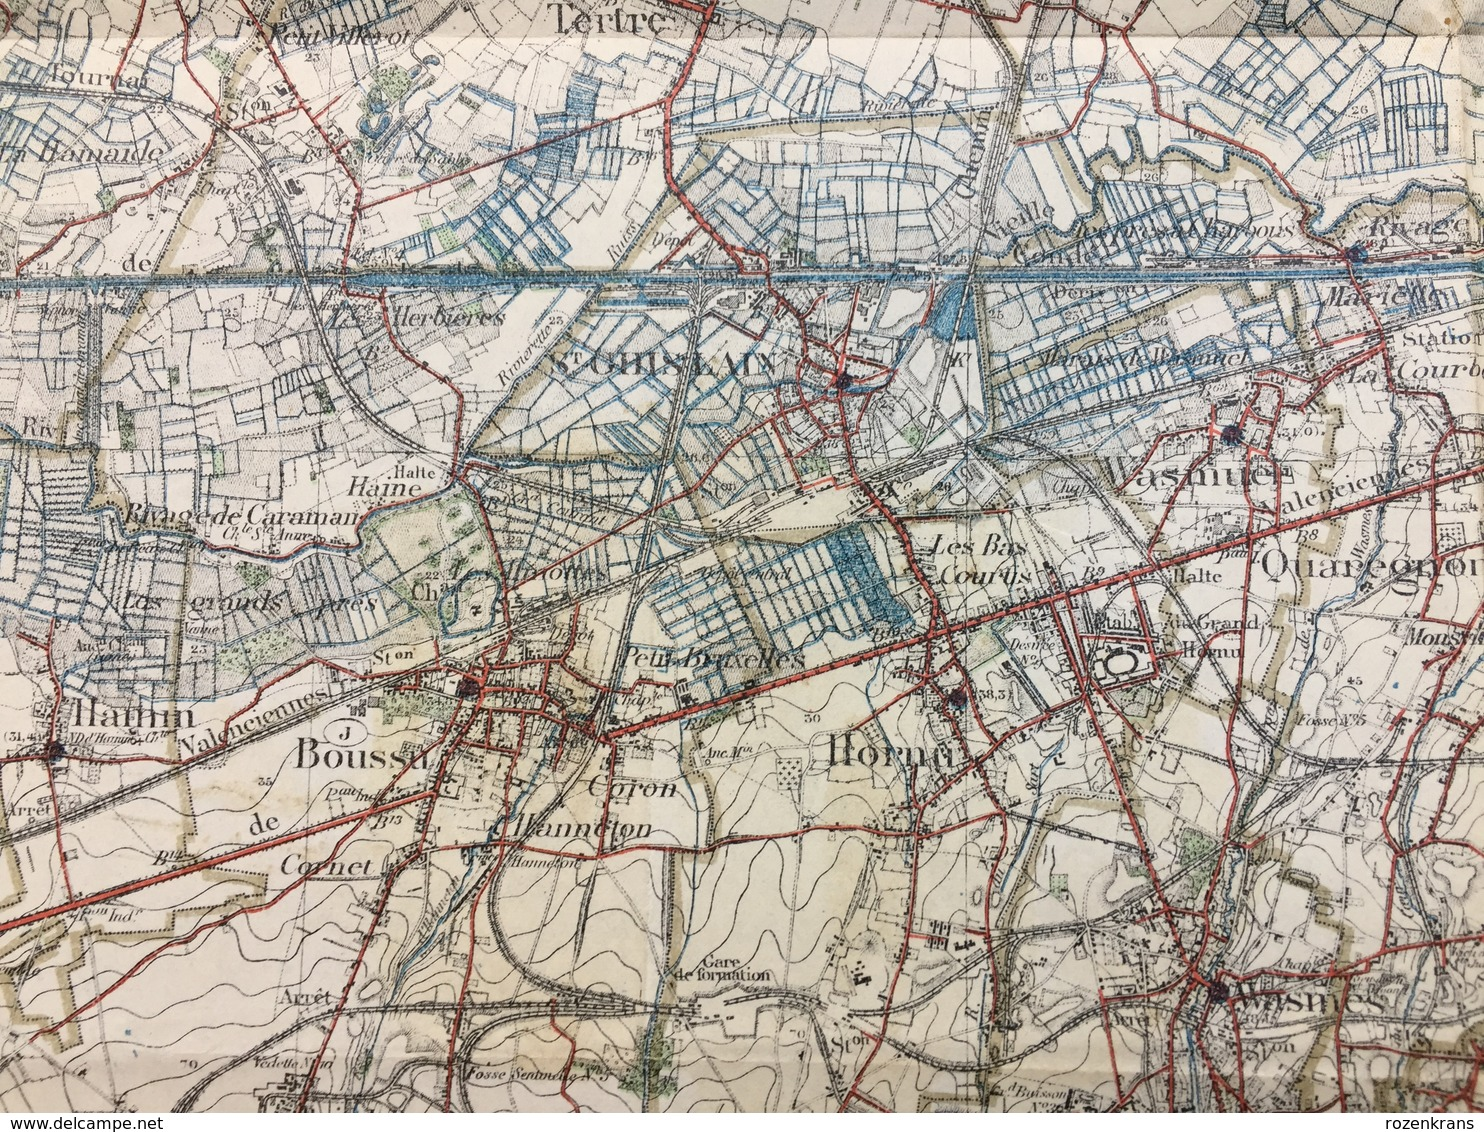 Topografische En Militaire Kaart STAFKAART Mons Borinage Hornu Dour Terte Baudour Belouil Quievrain Quaregnon Obourg - Cartes Topographiques